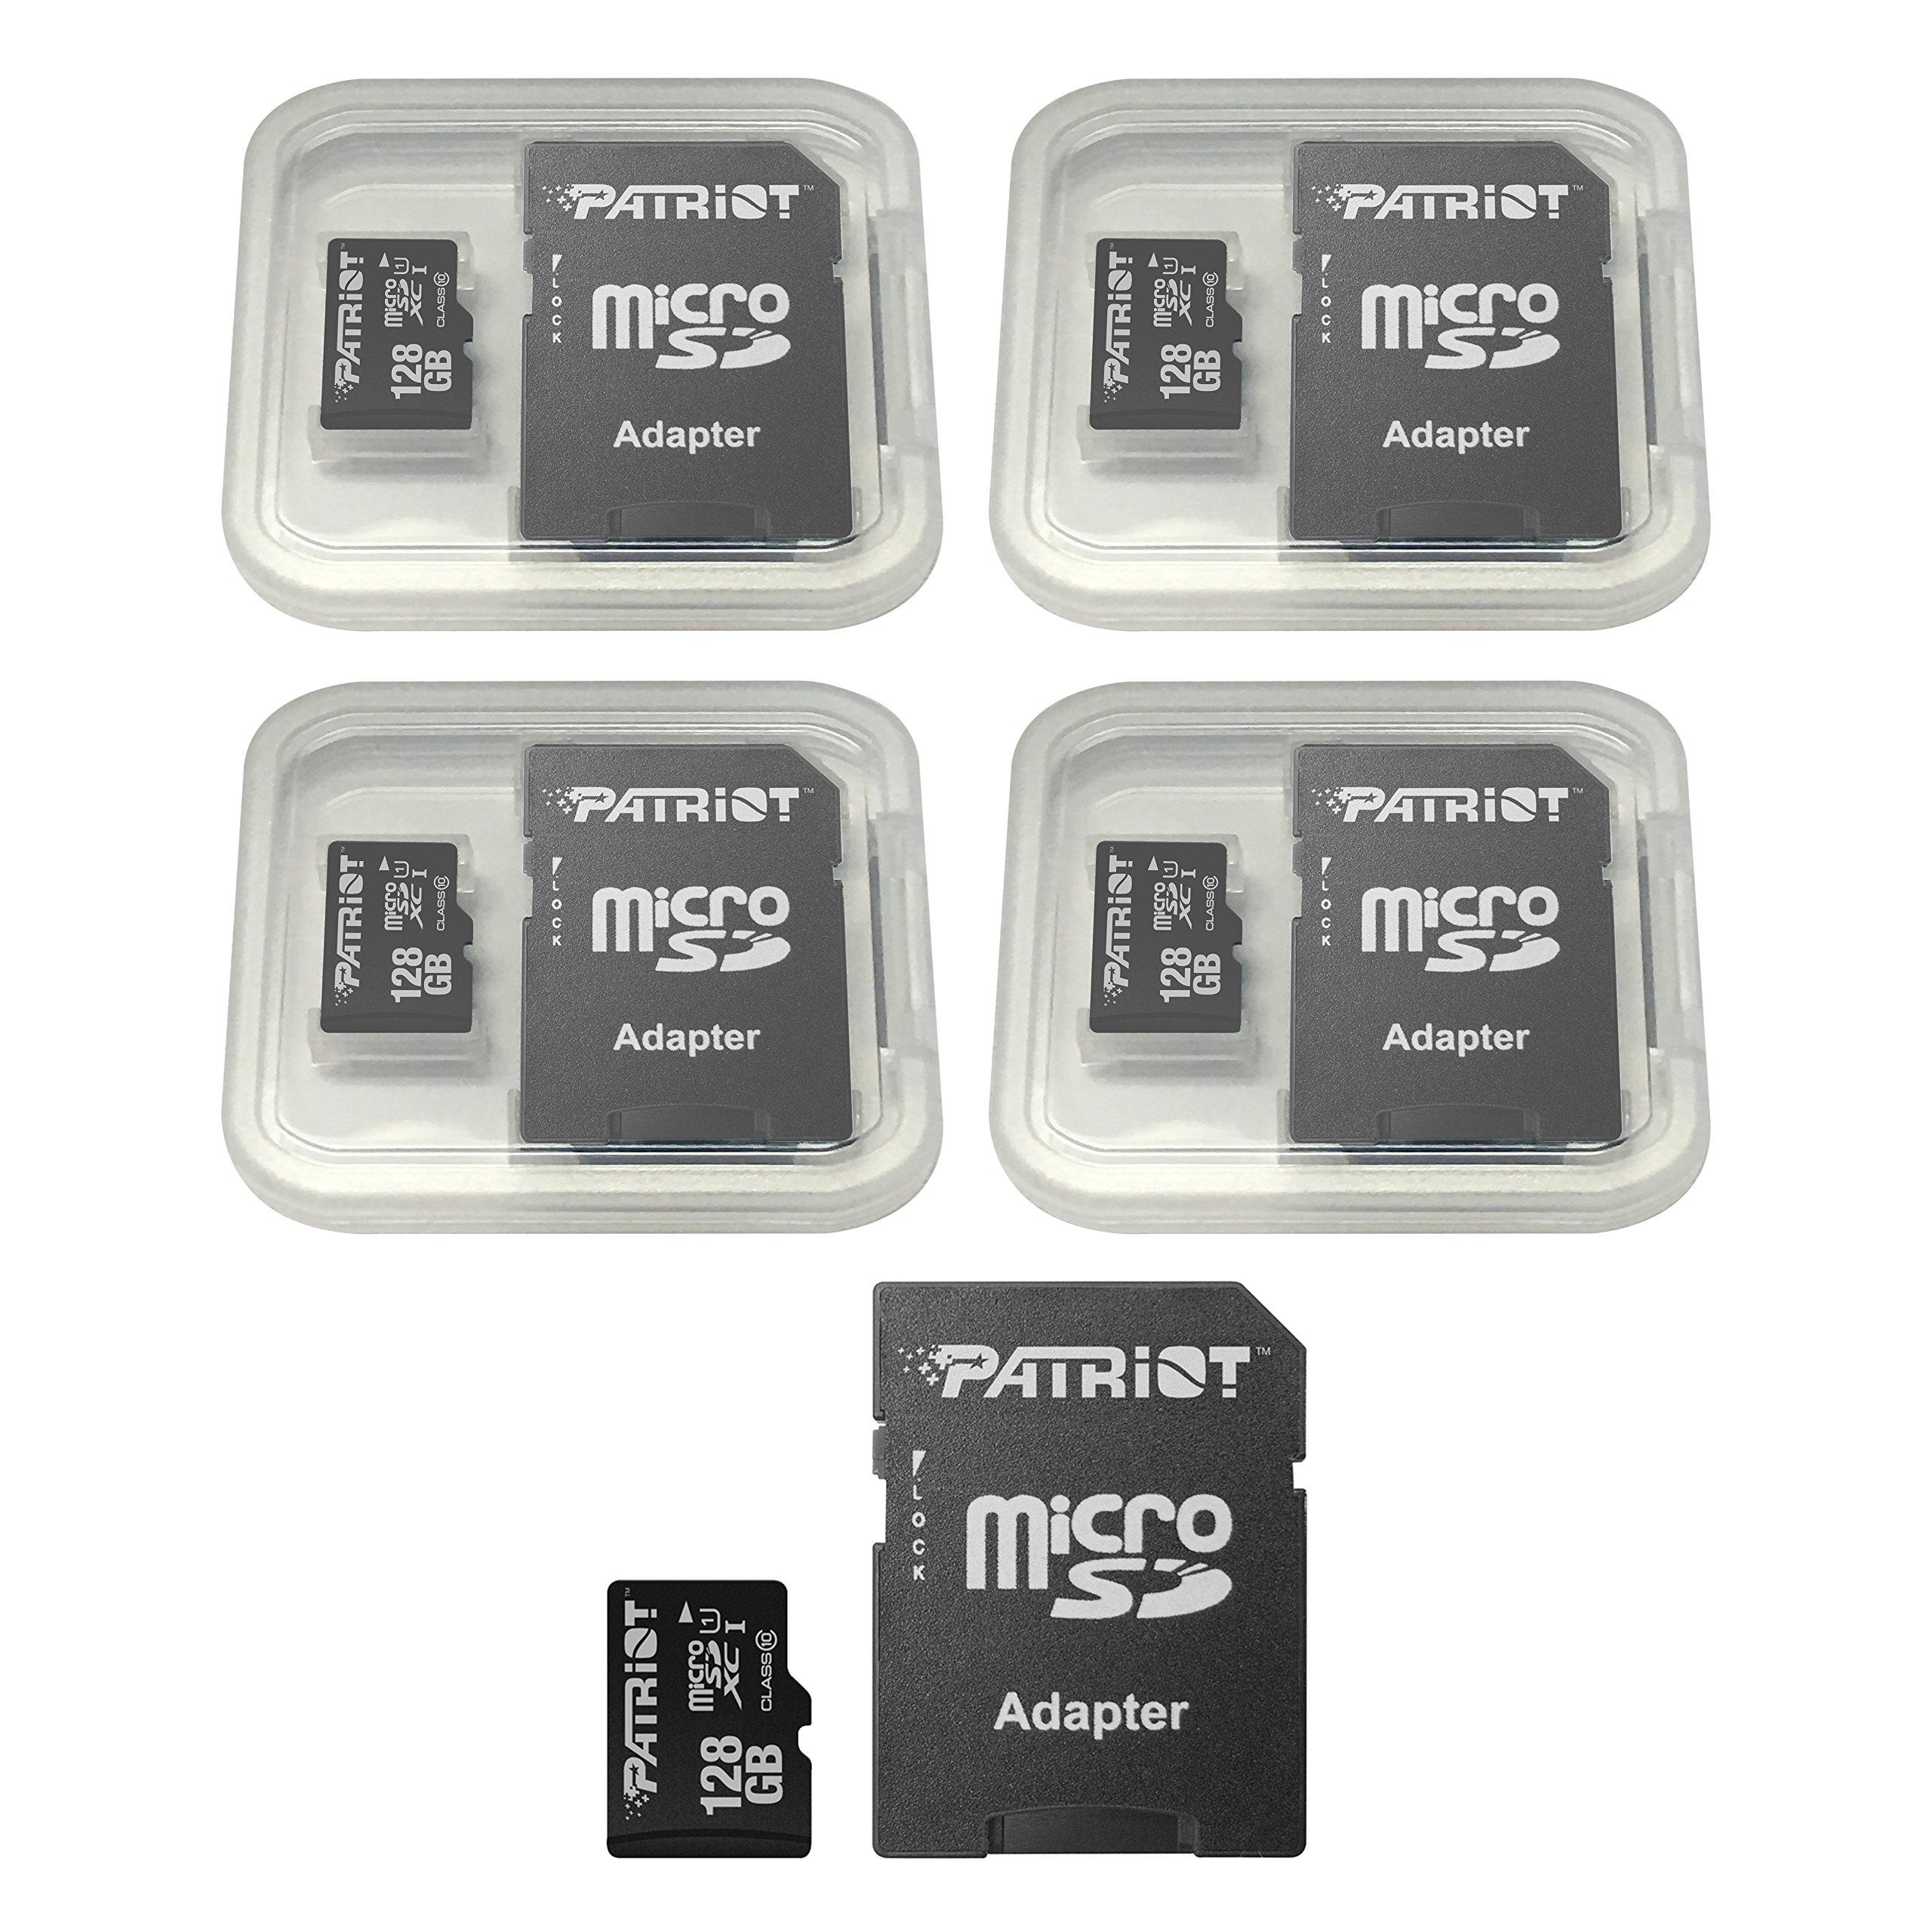 Patriot LX Series 128GB Micro SDXC - Class 10 UHS-I - 5 Pack